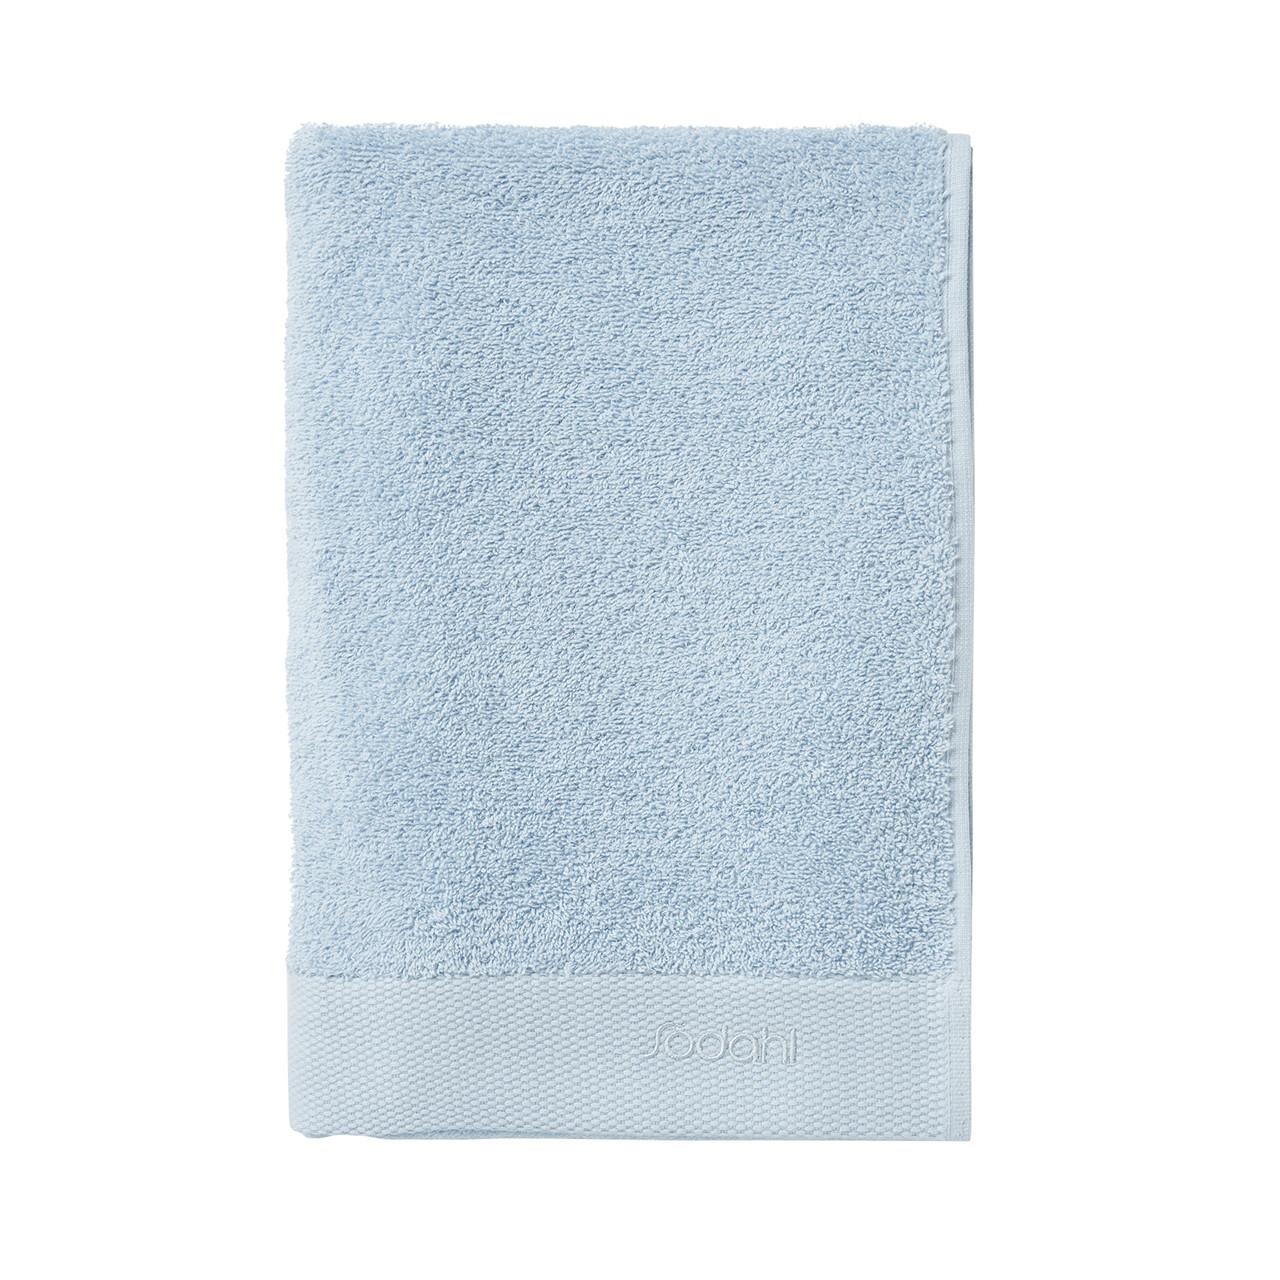 SÖDAHL Håndklæde 70x140 Comfort Sky blue